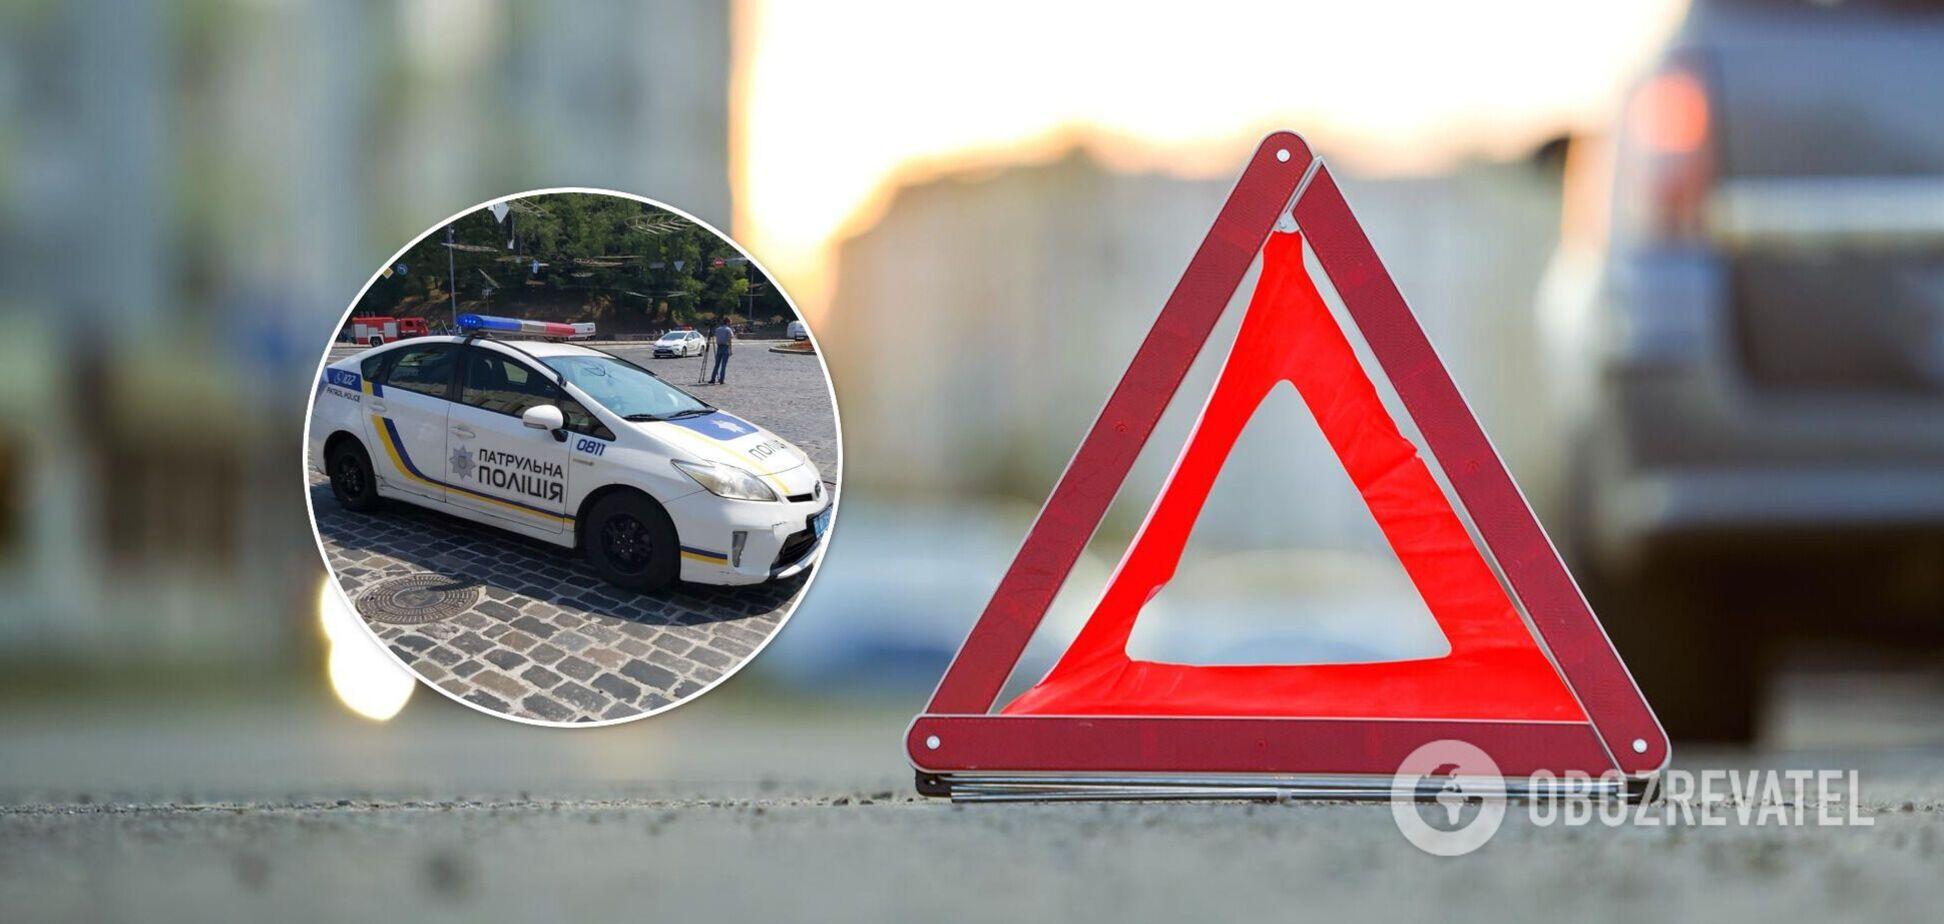 Беглеца правоохранители задержали на улице Волкова